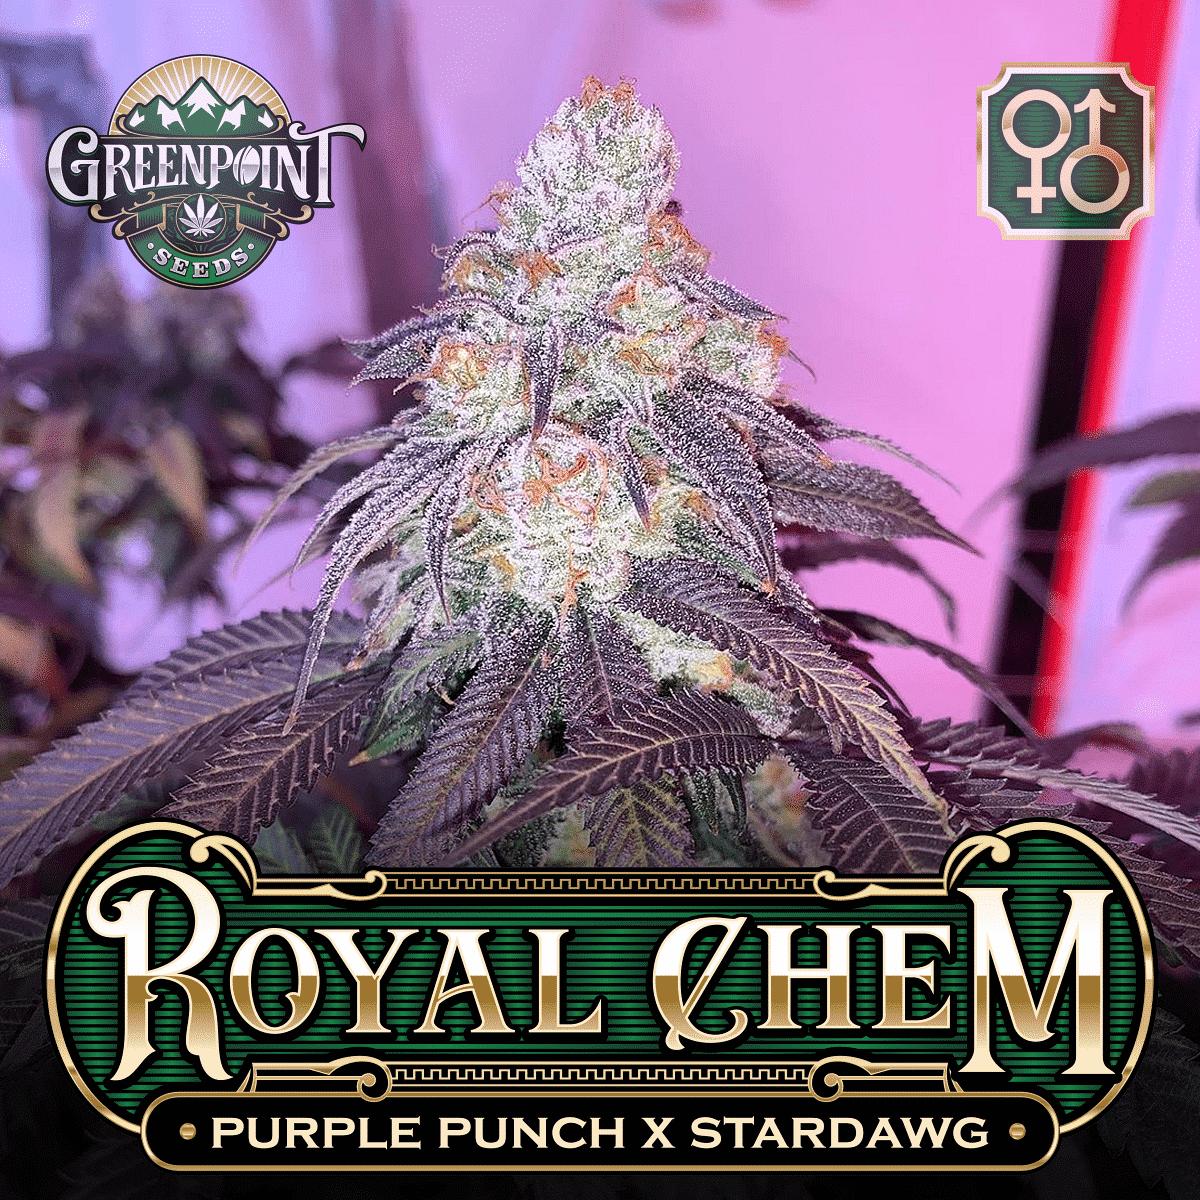 Purple Punch x Stardawg - Royal Chem Regular Cannabis Seeds - Greenpoint Seeds